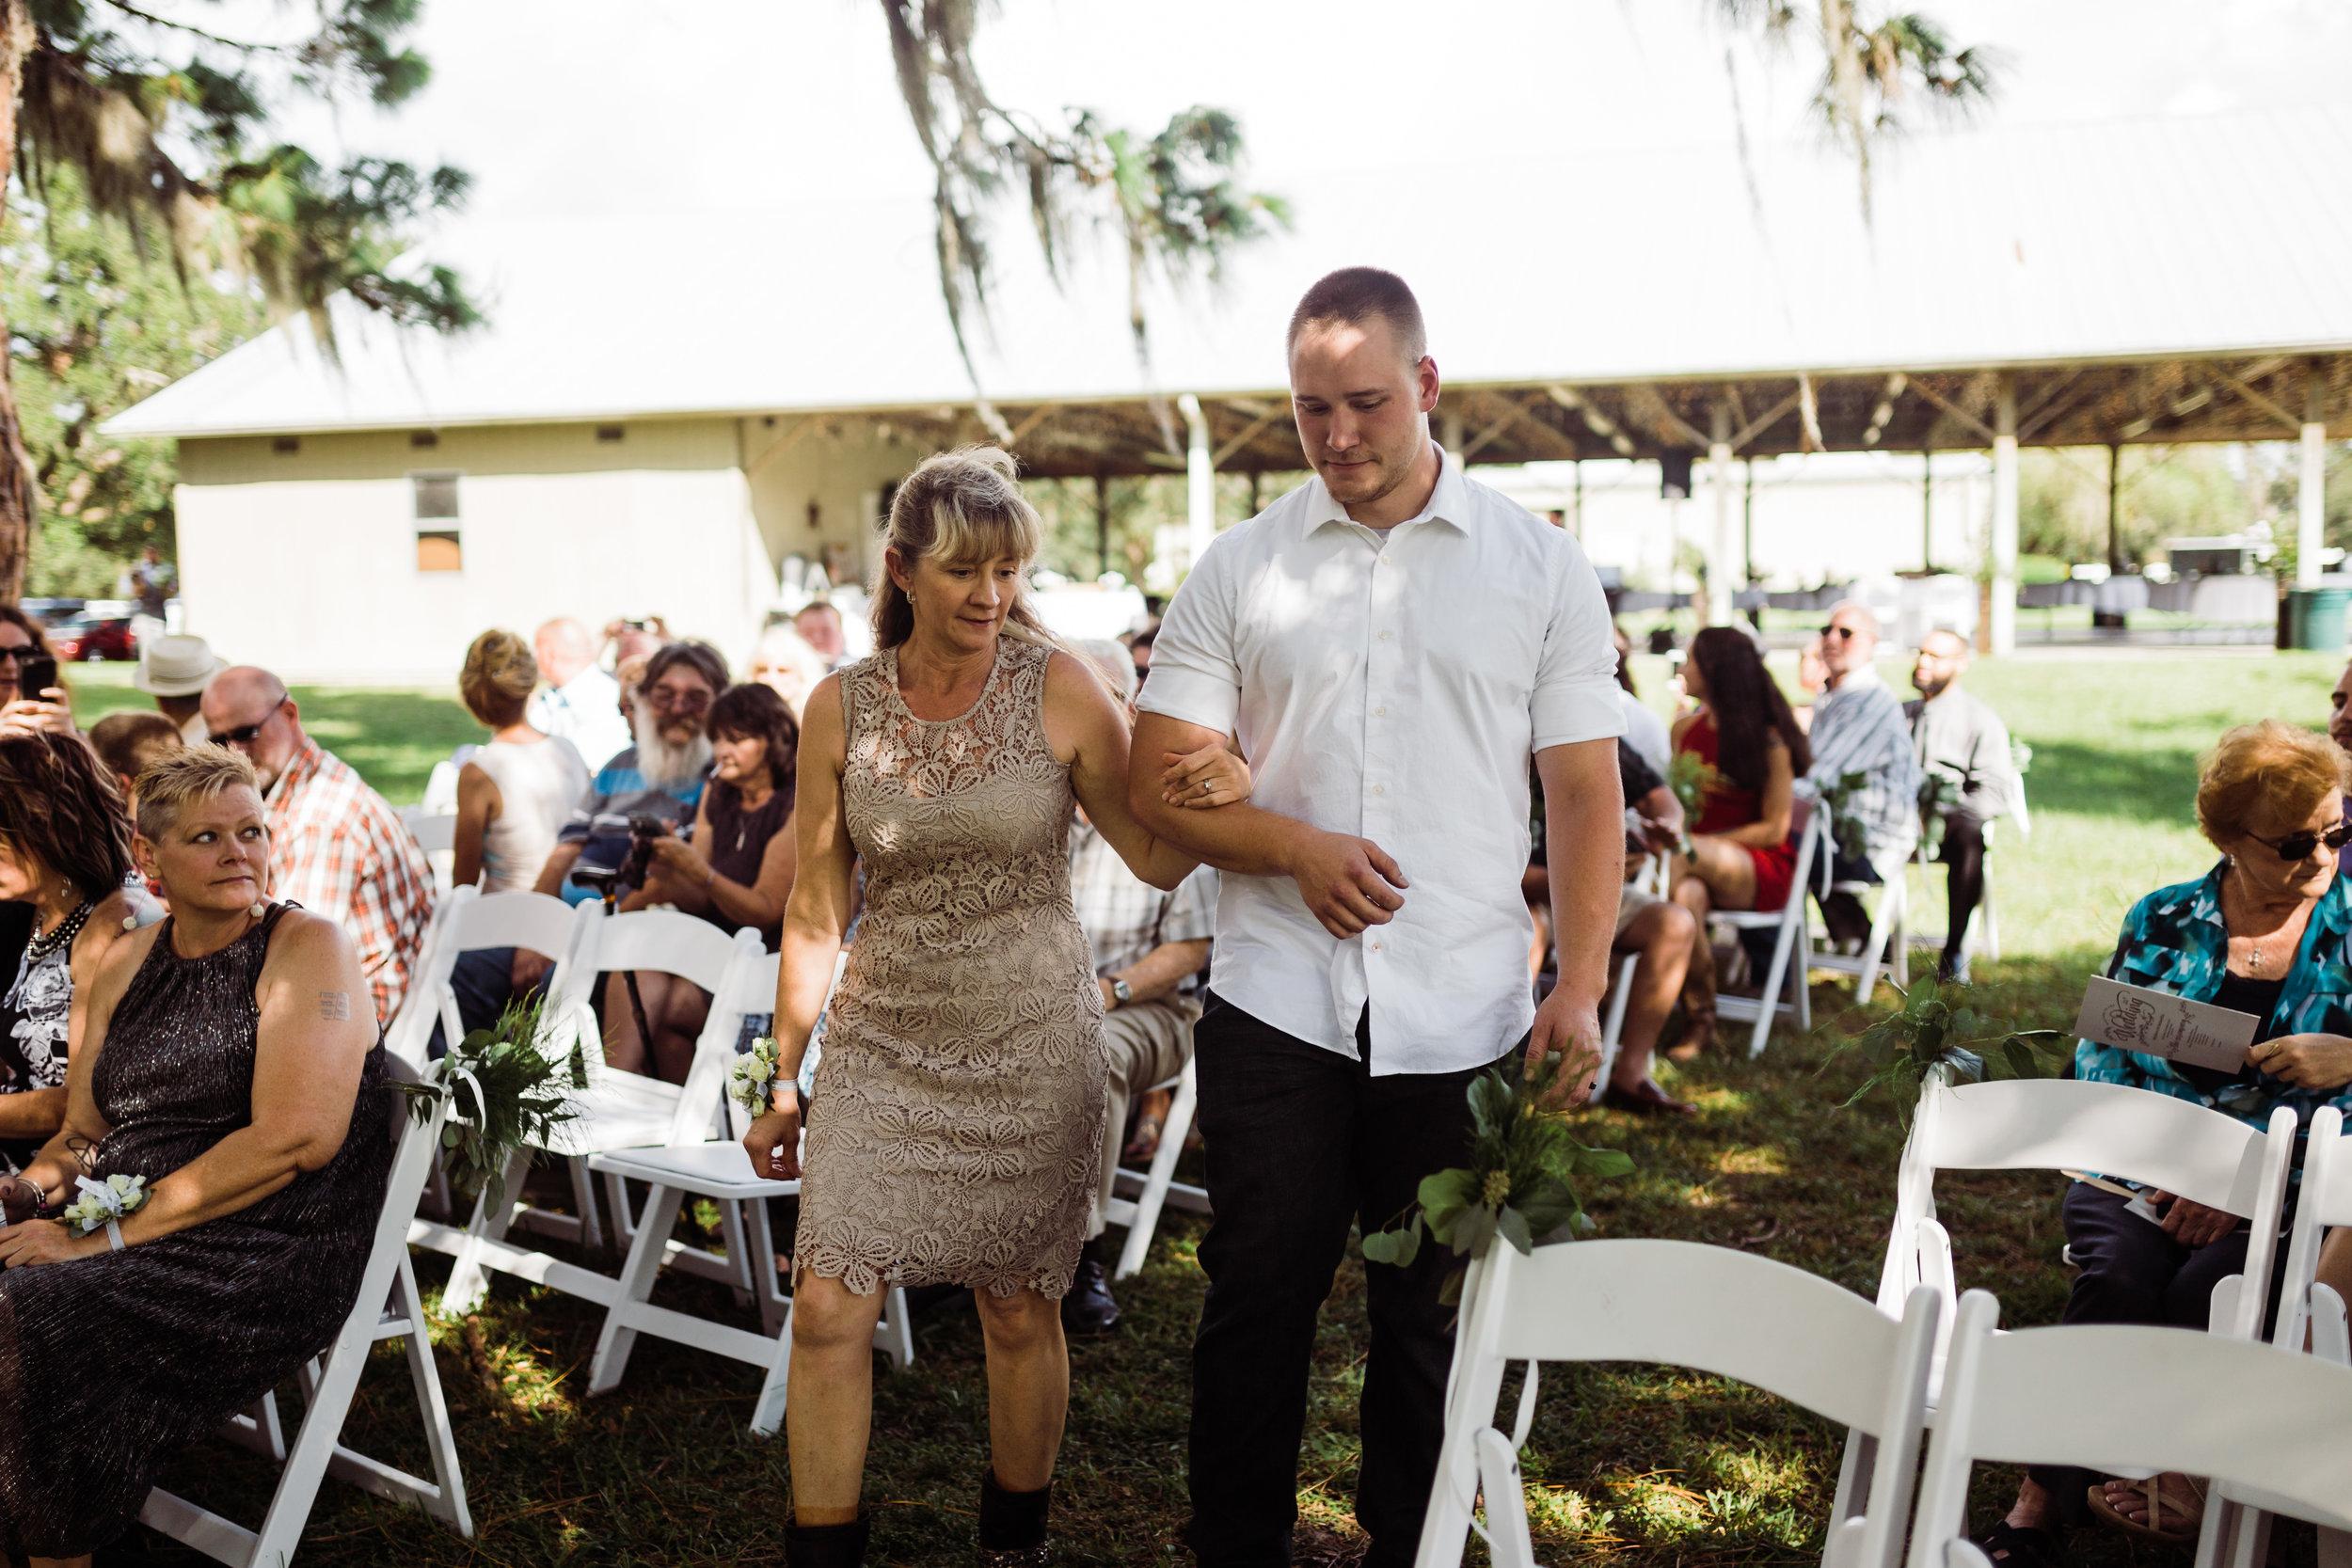 2017.10.14 Samantha and Matthew Crabtree Sarasota Wedding (103 of 708).jpg